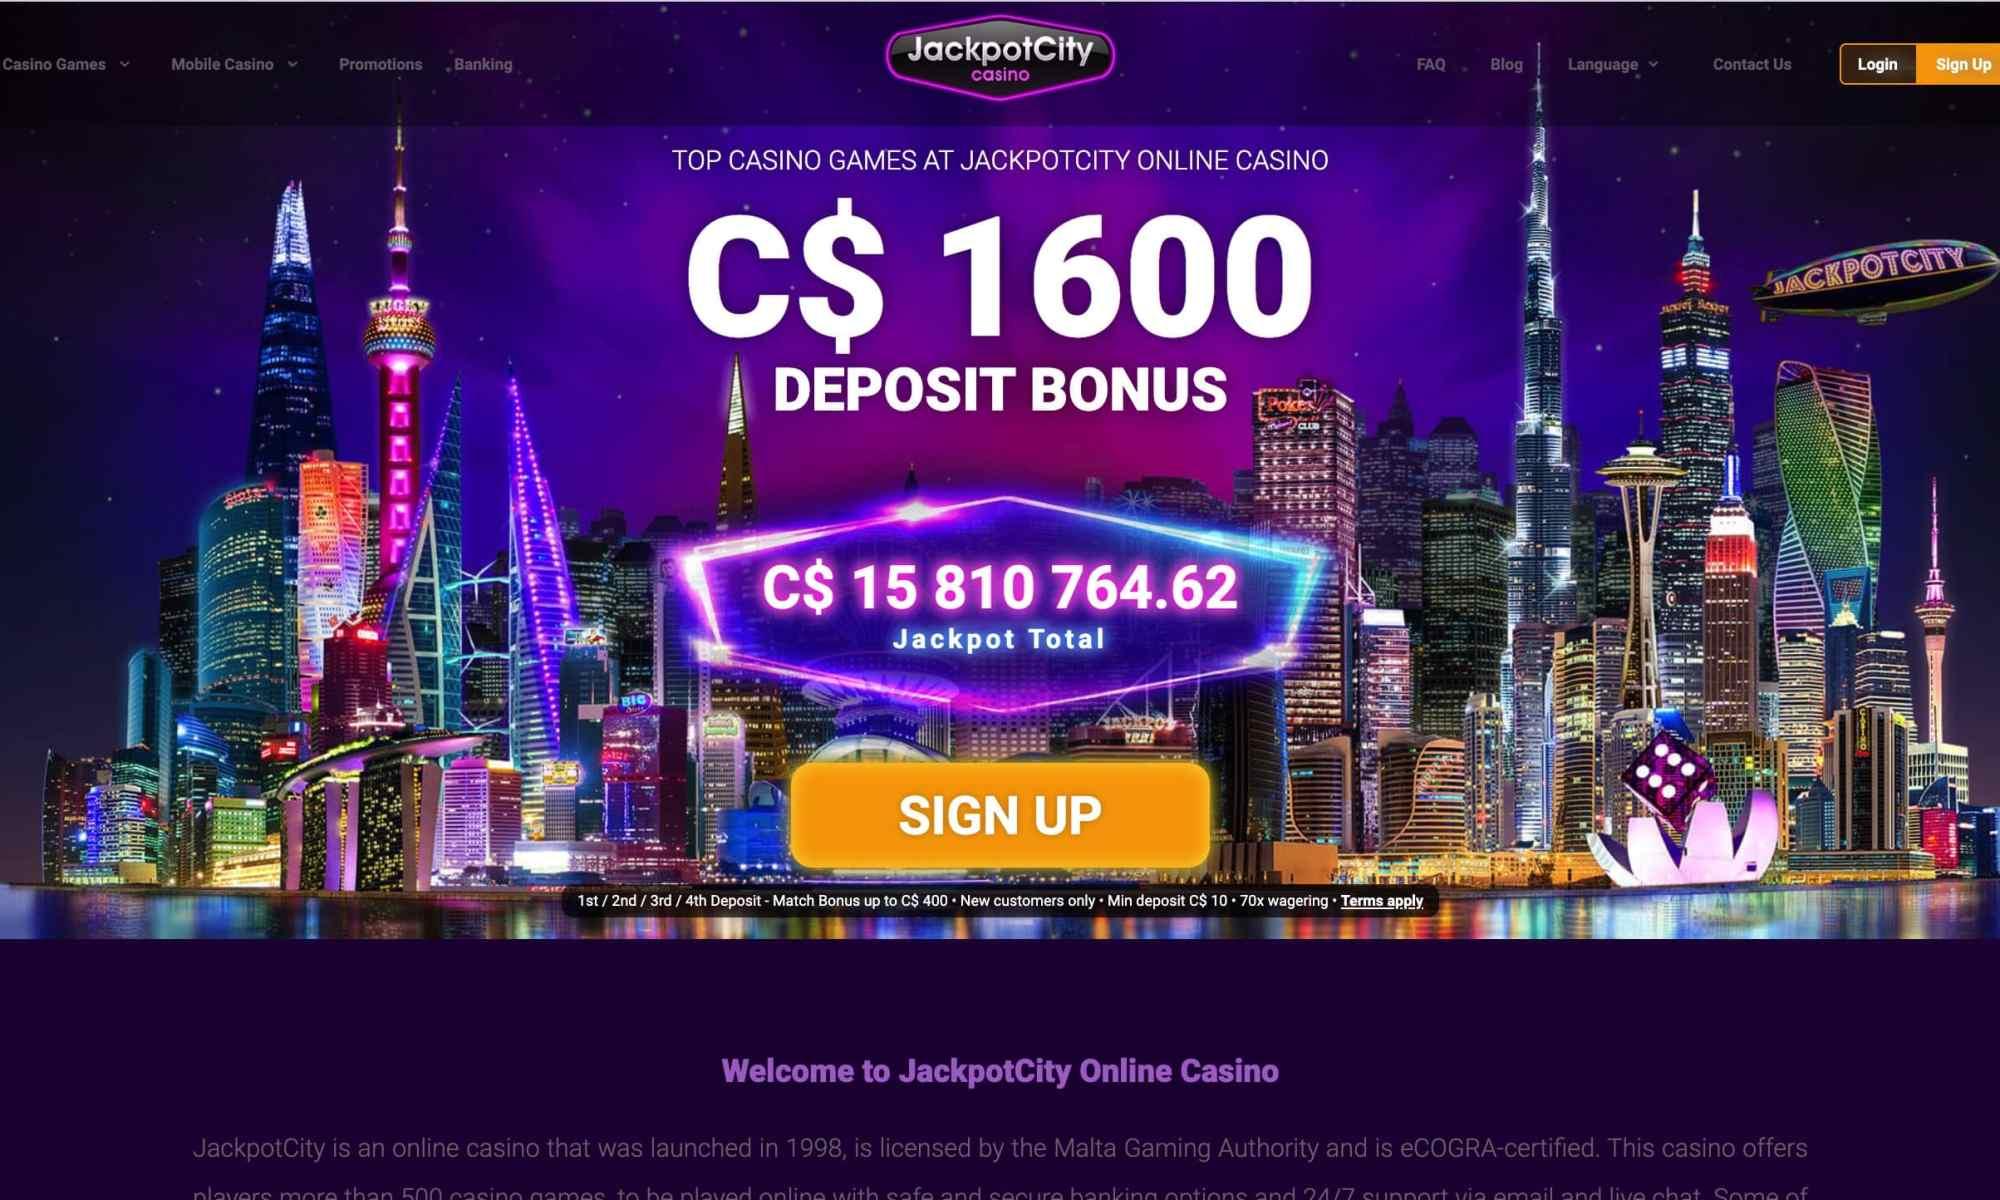 Jackpot City Casino - get $1,600 deposit match bonus